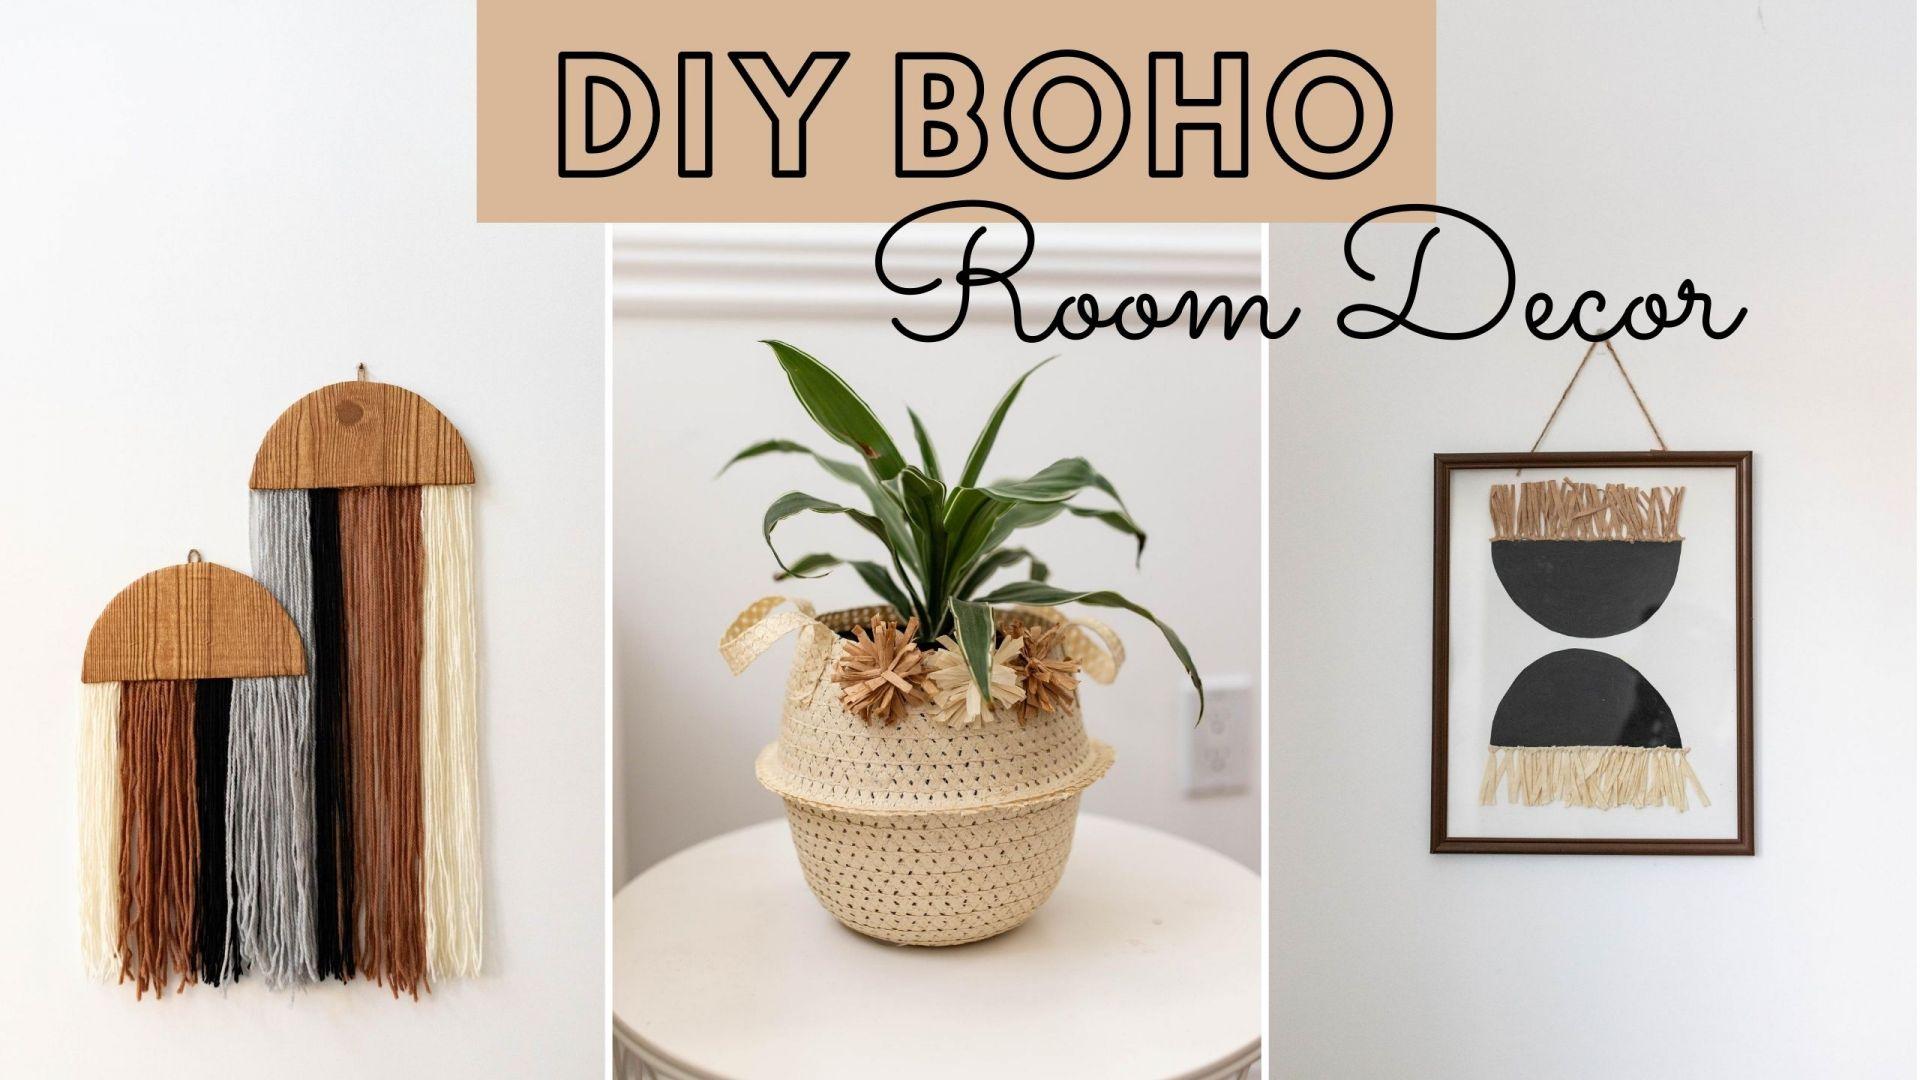 3 Easy DIY boho Decor Ideas